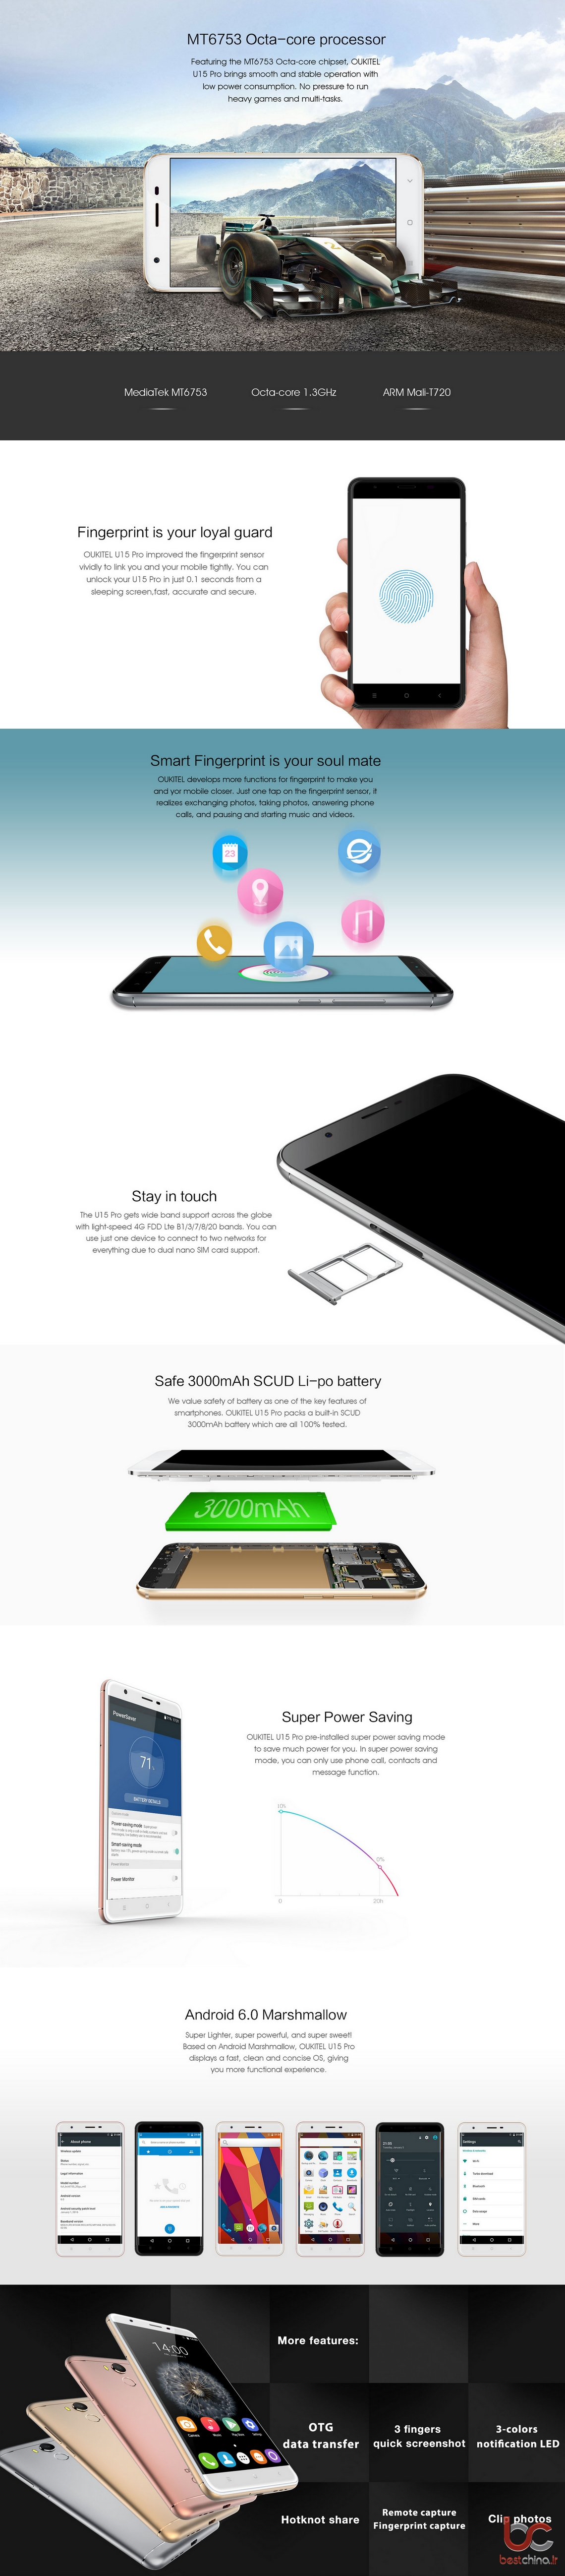 fireshot-screen-capture-708-oukitel-smartphone-oukitel_com_products_u_u15-pro-55_html